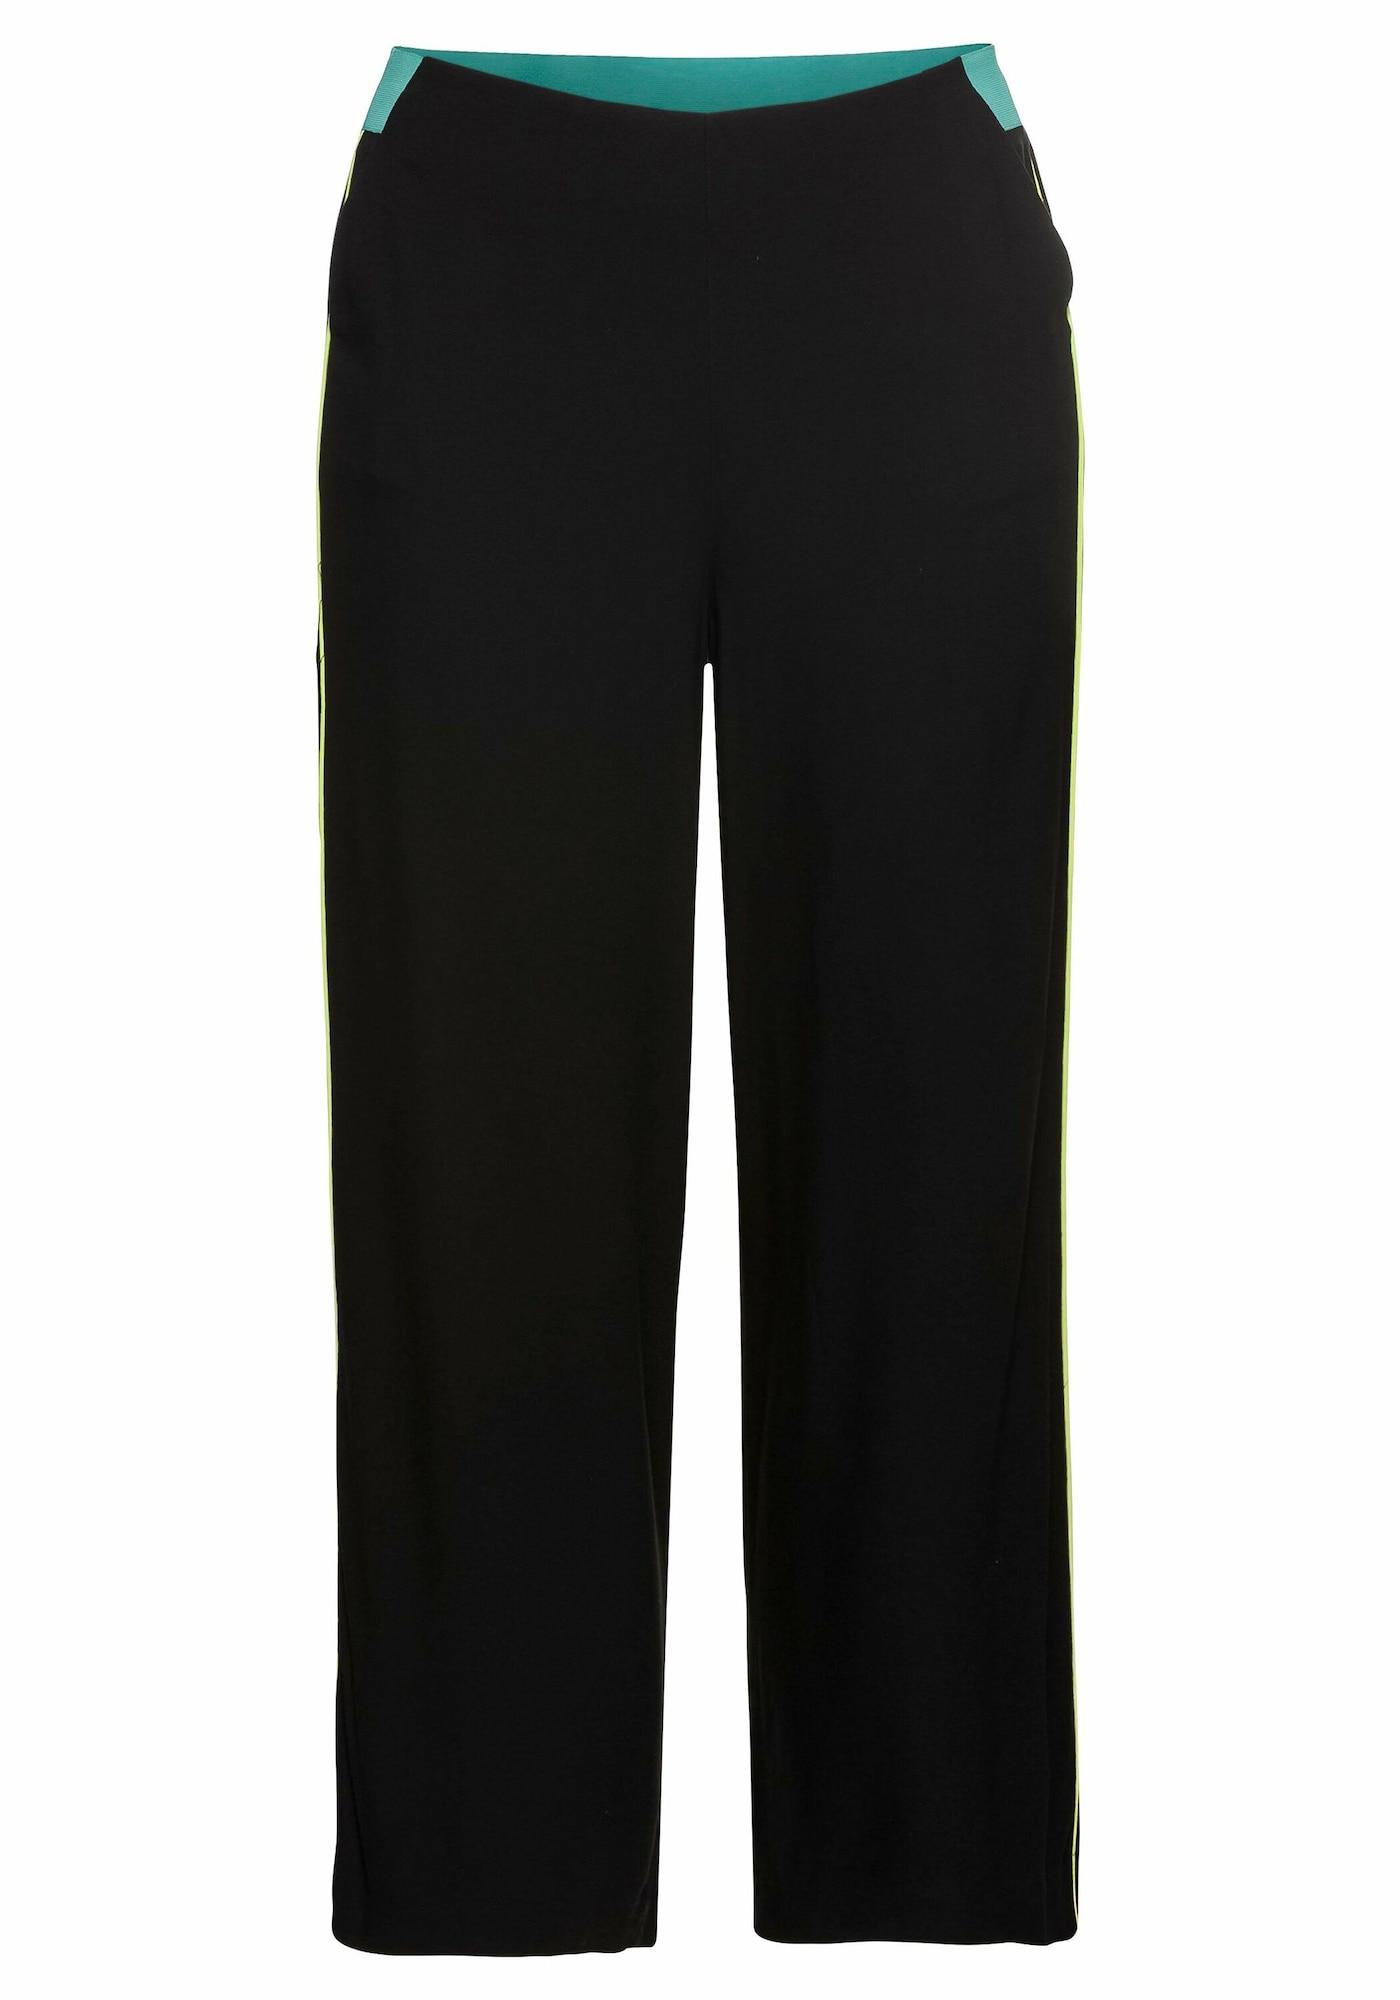 SHEEGO Kelnės juoda / turkio spalva / geltona